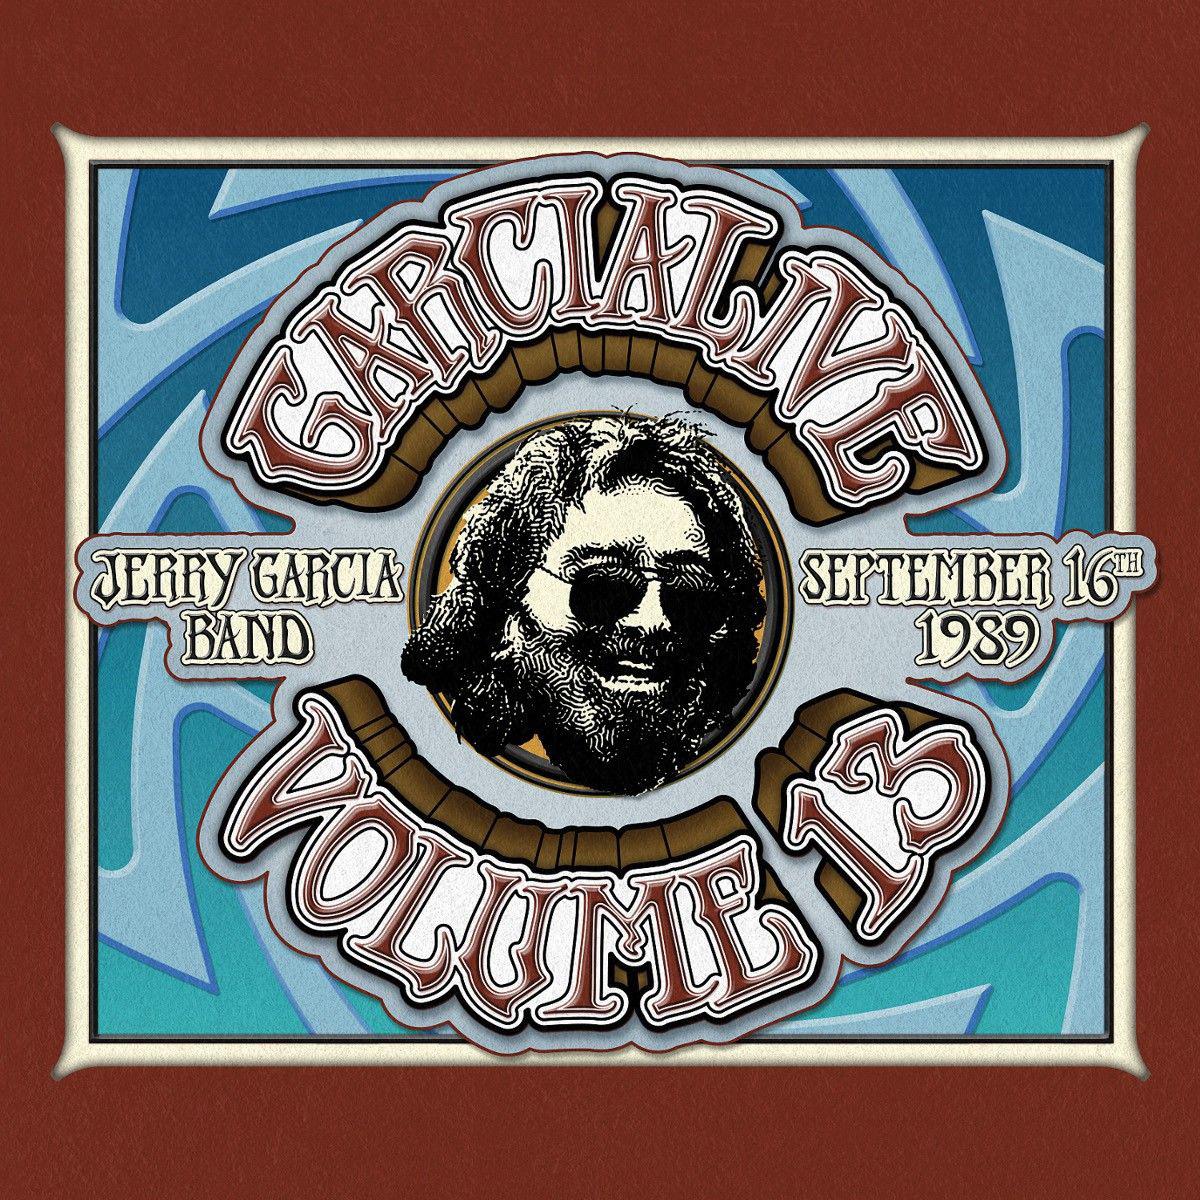 Jerry Garcia Band – GarciaLive Volume 13: 09/16/89 CD or Digital Download & Organic T-Shirt Bundle